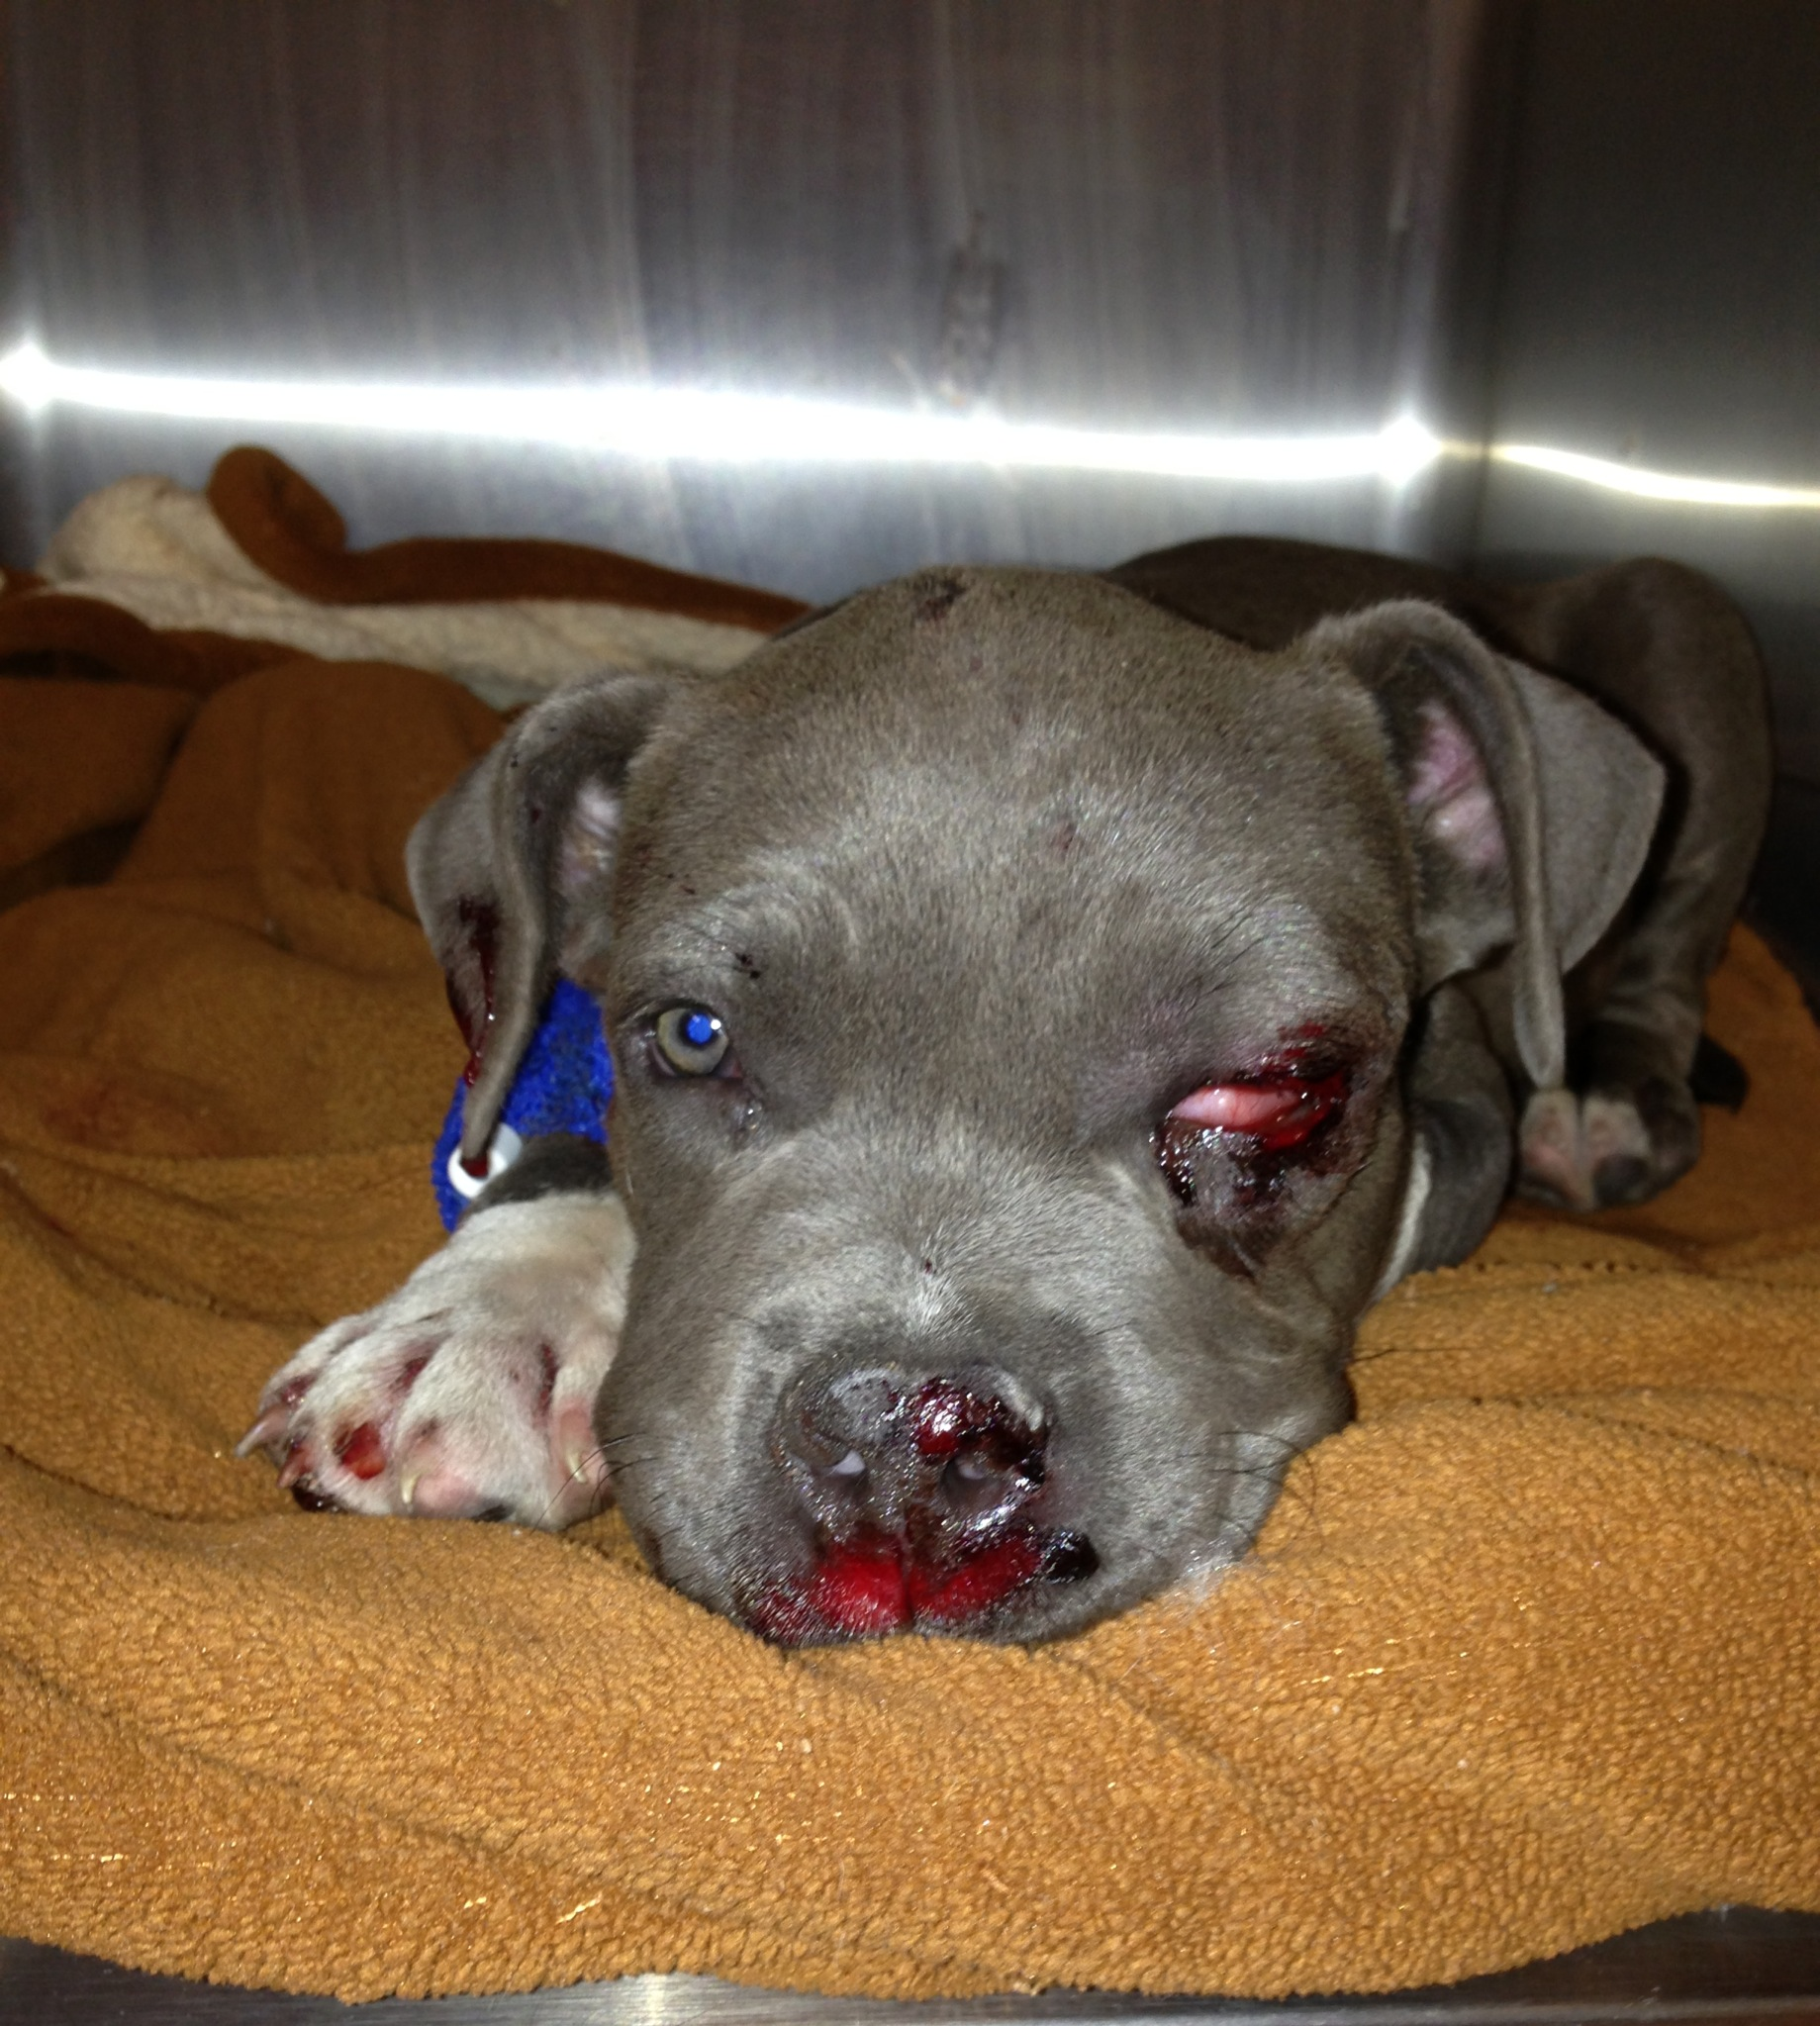 Cute baby pitbull dog